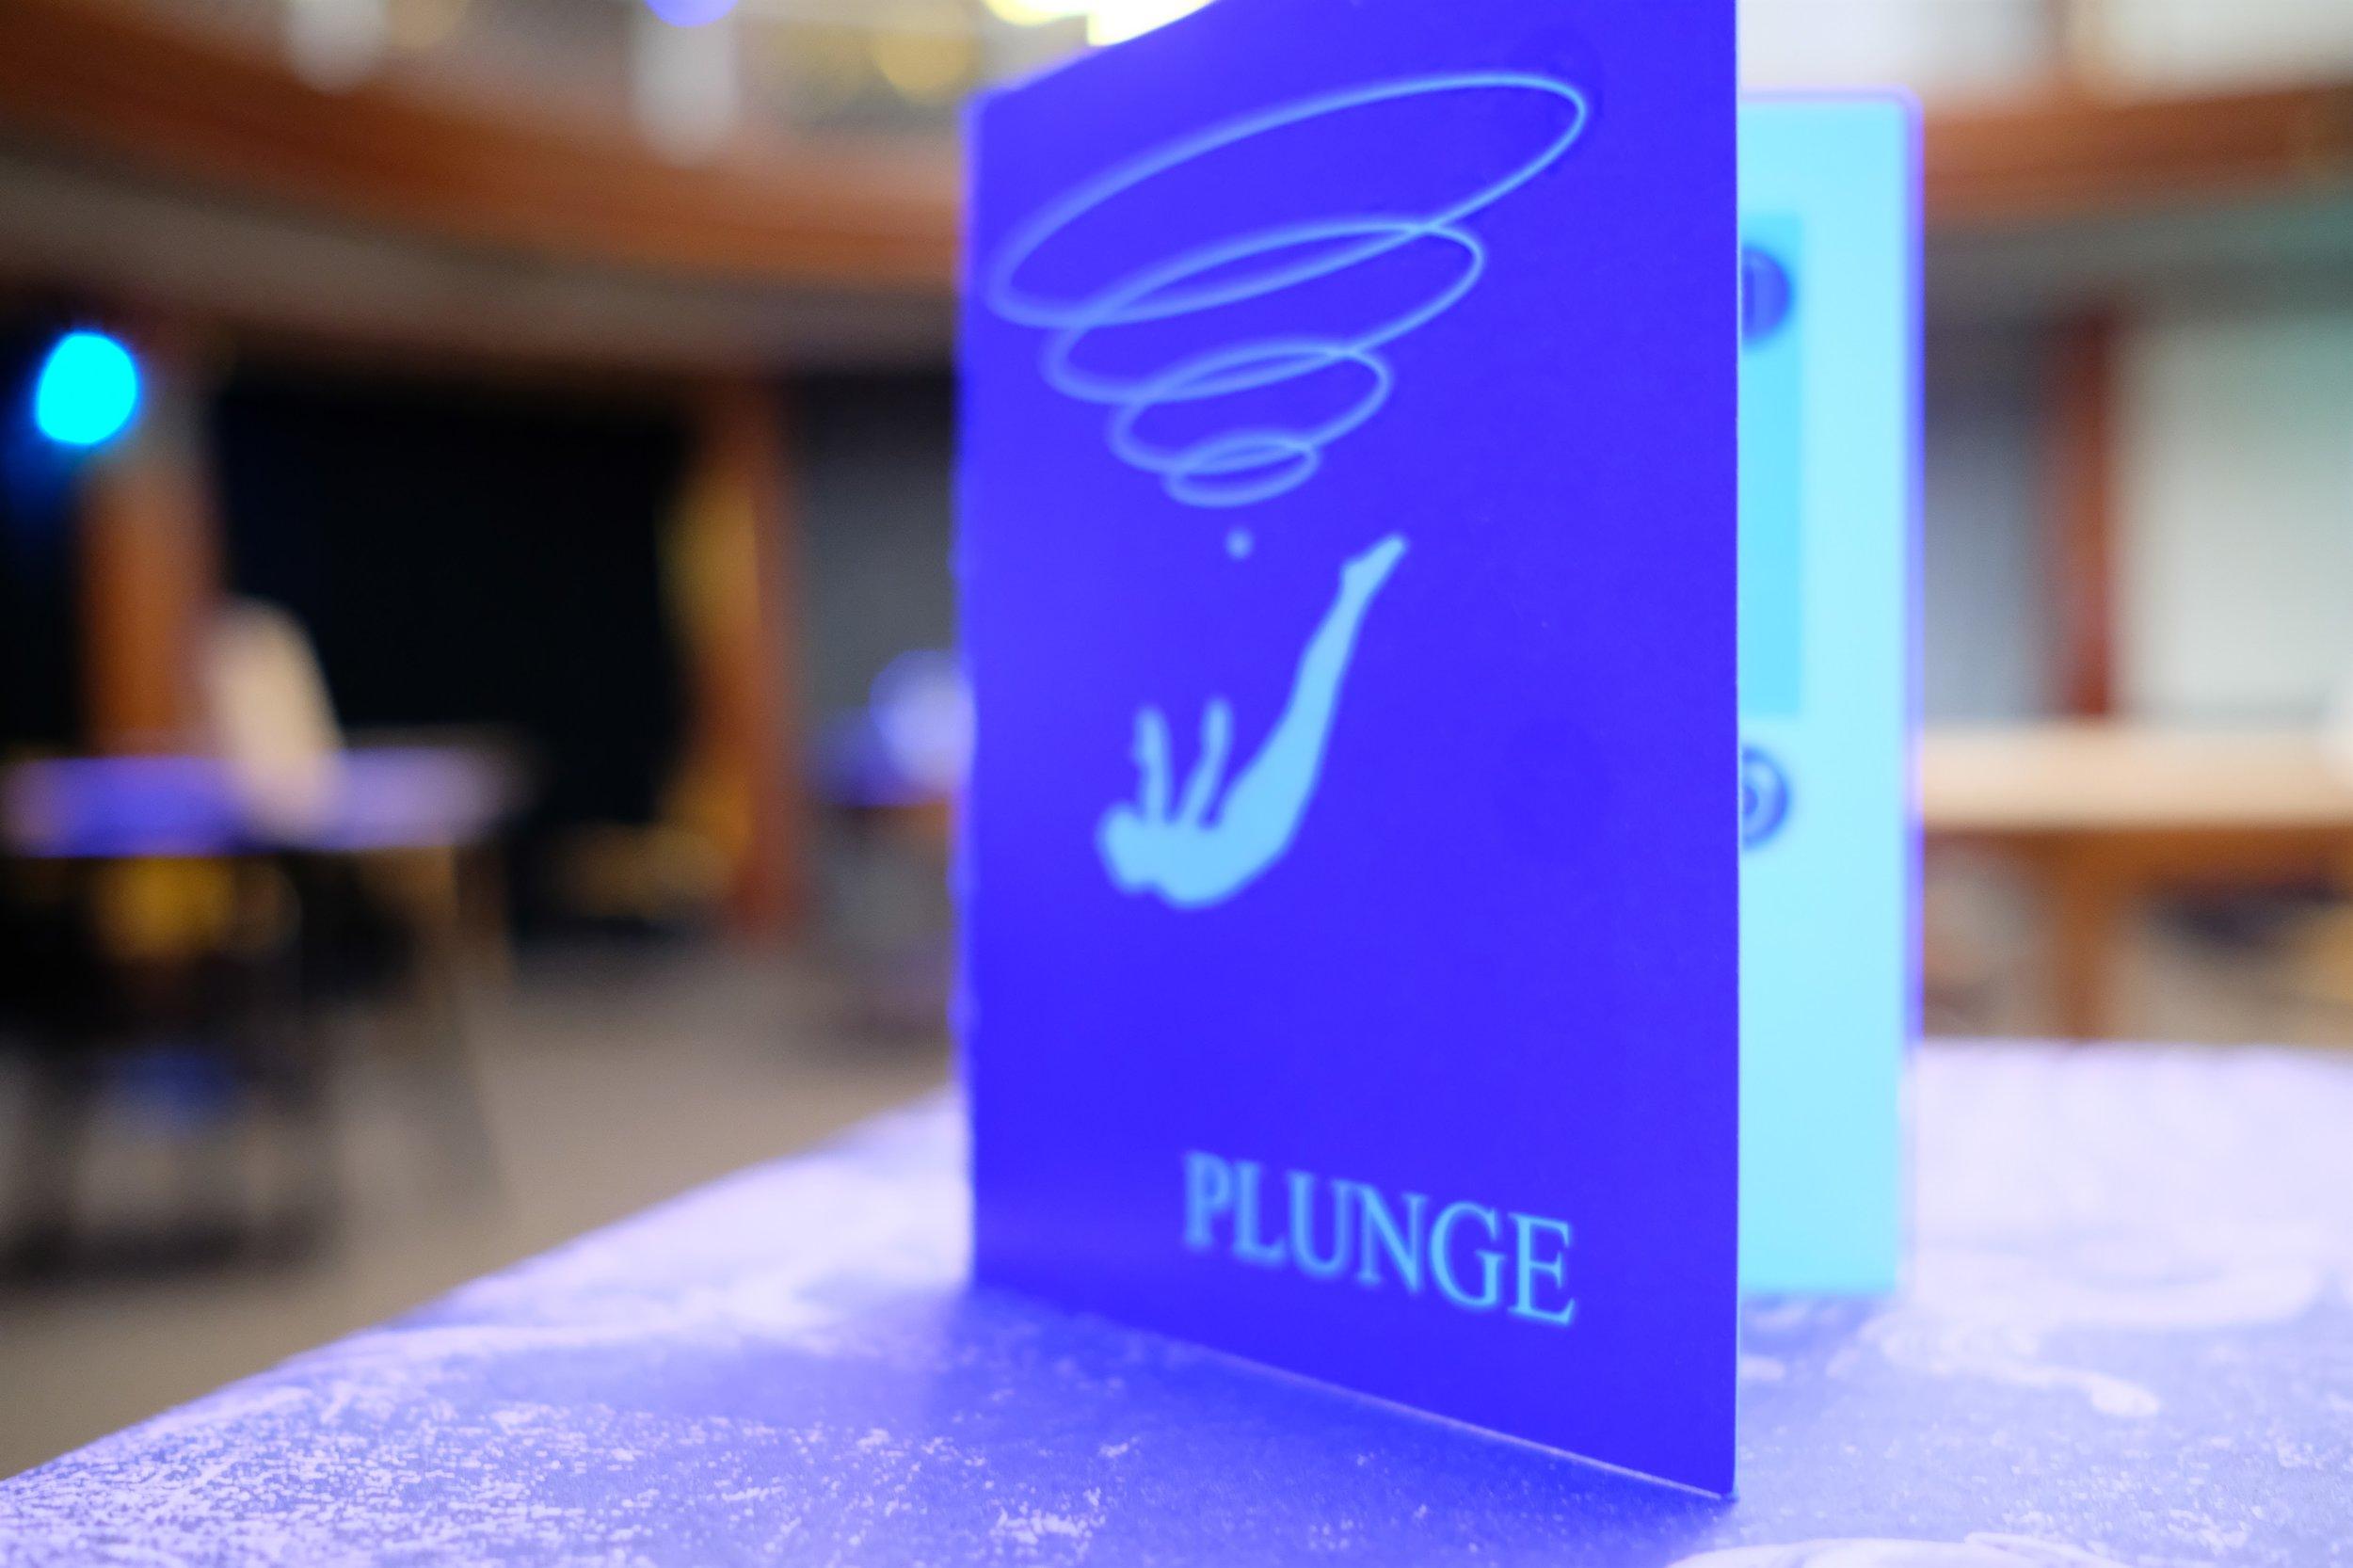 Plunge   Production Photo courtesy of Glenn Ricci and Submersive Productions.